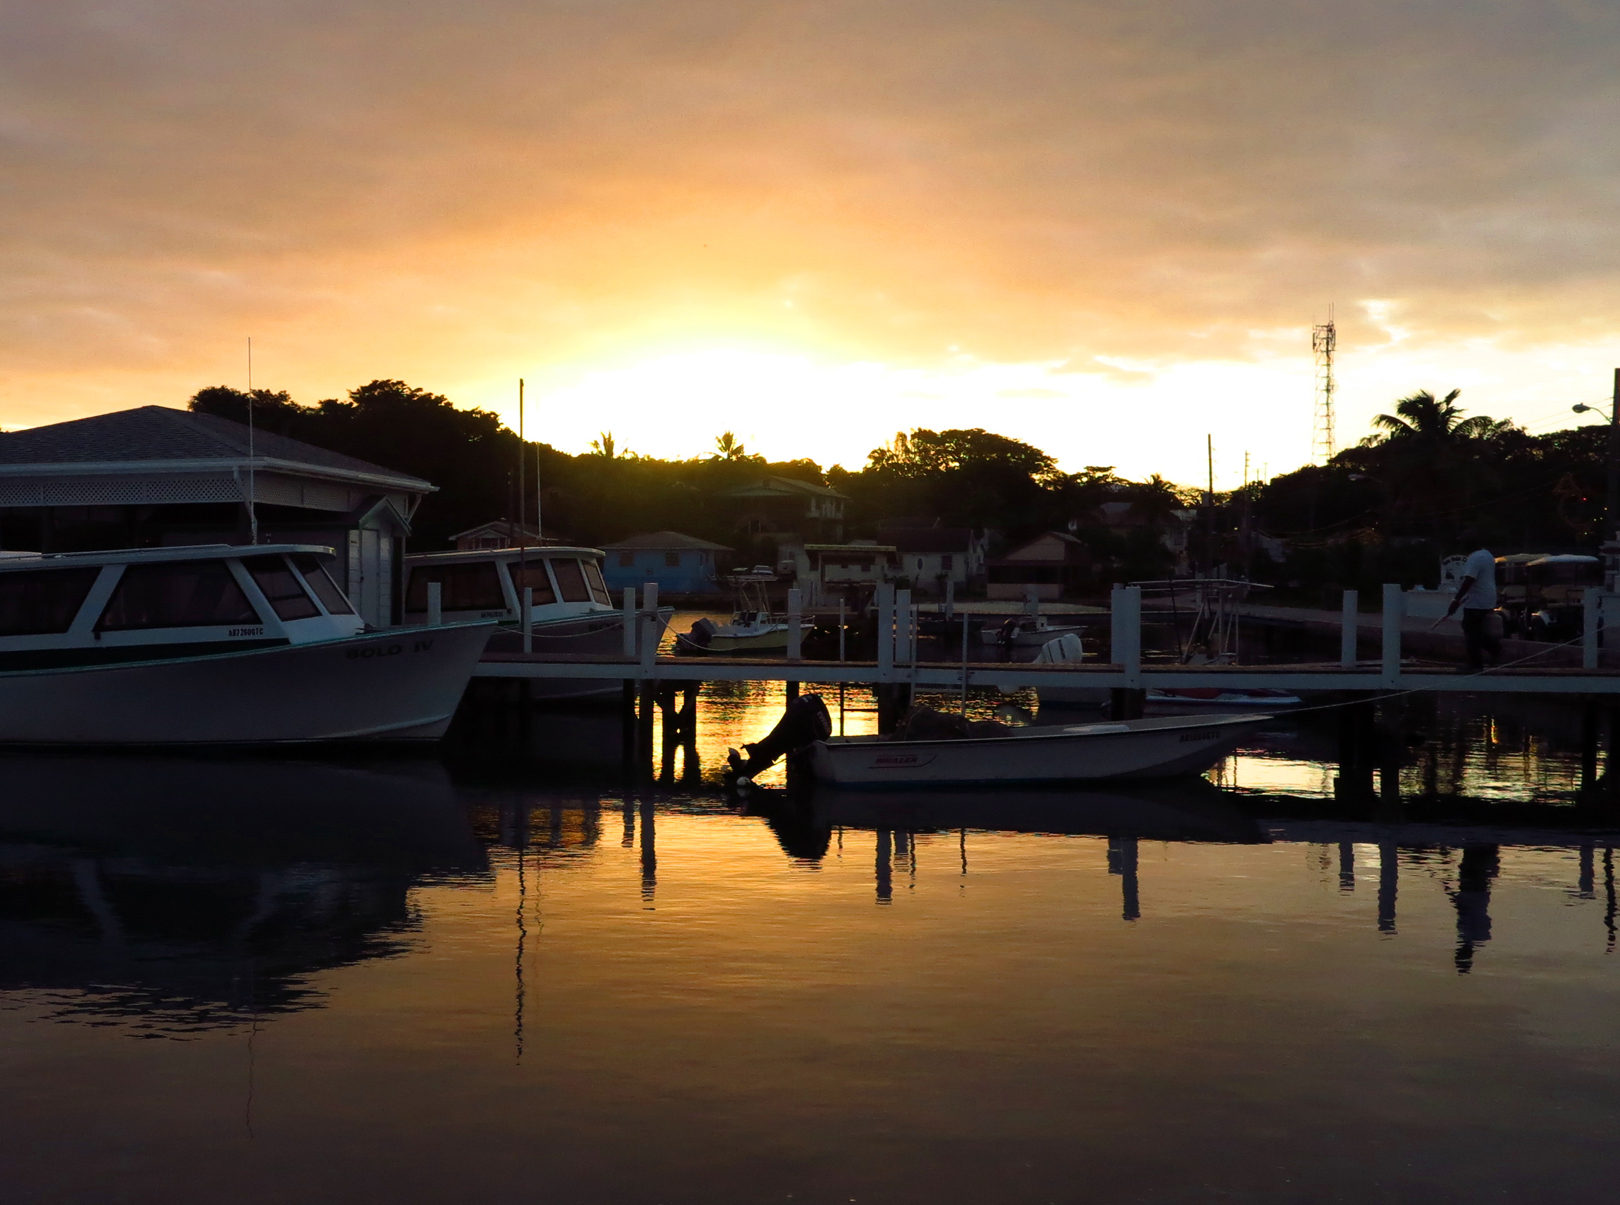 Sunrise over Settlement Creek, Green Turtle Cay, Bahamas.